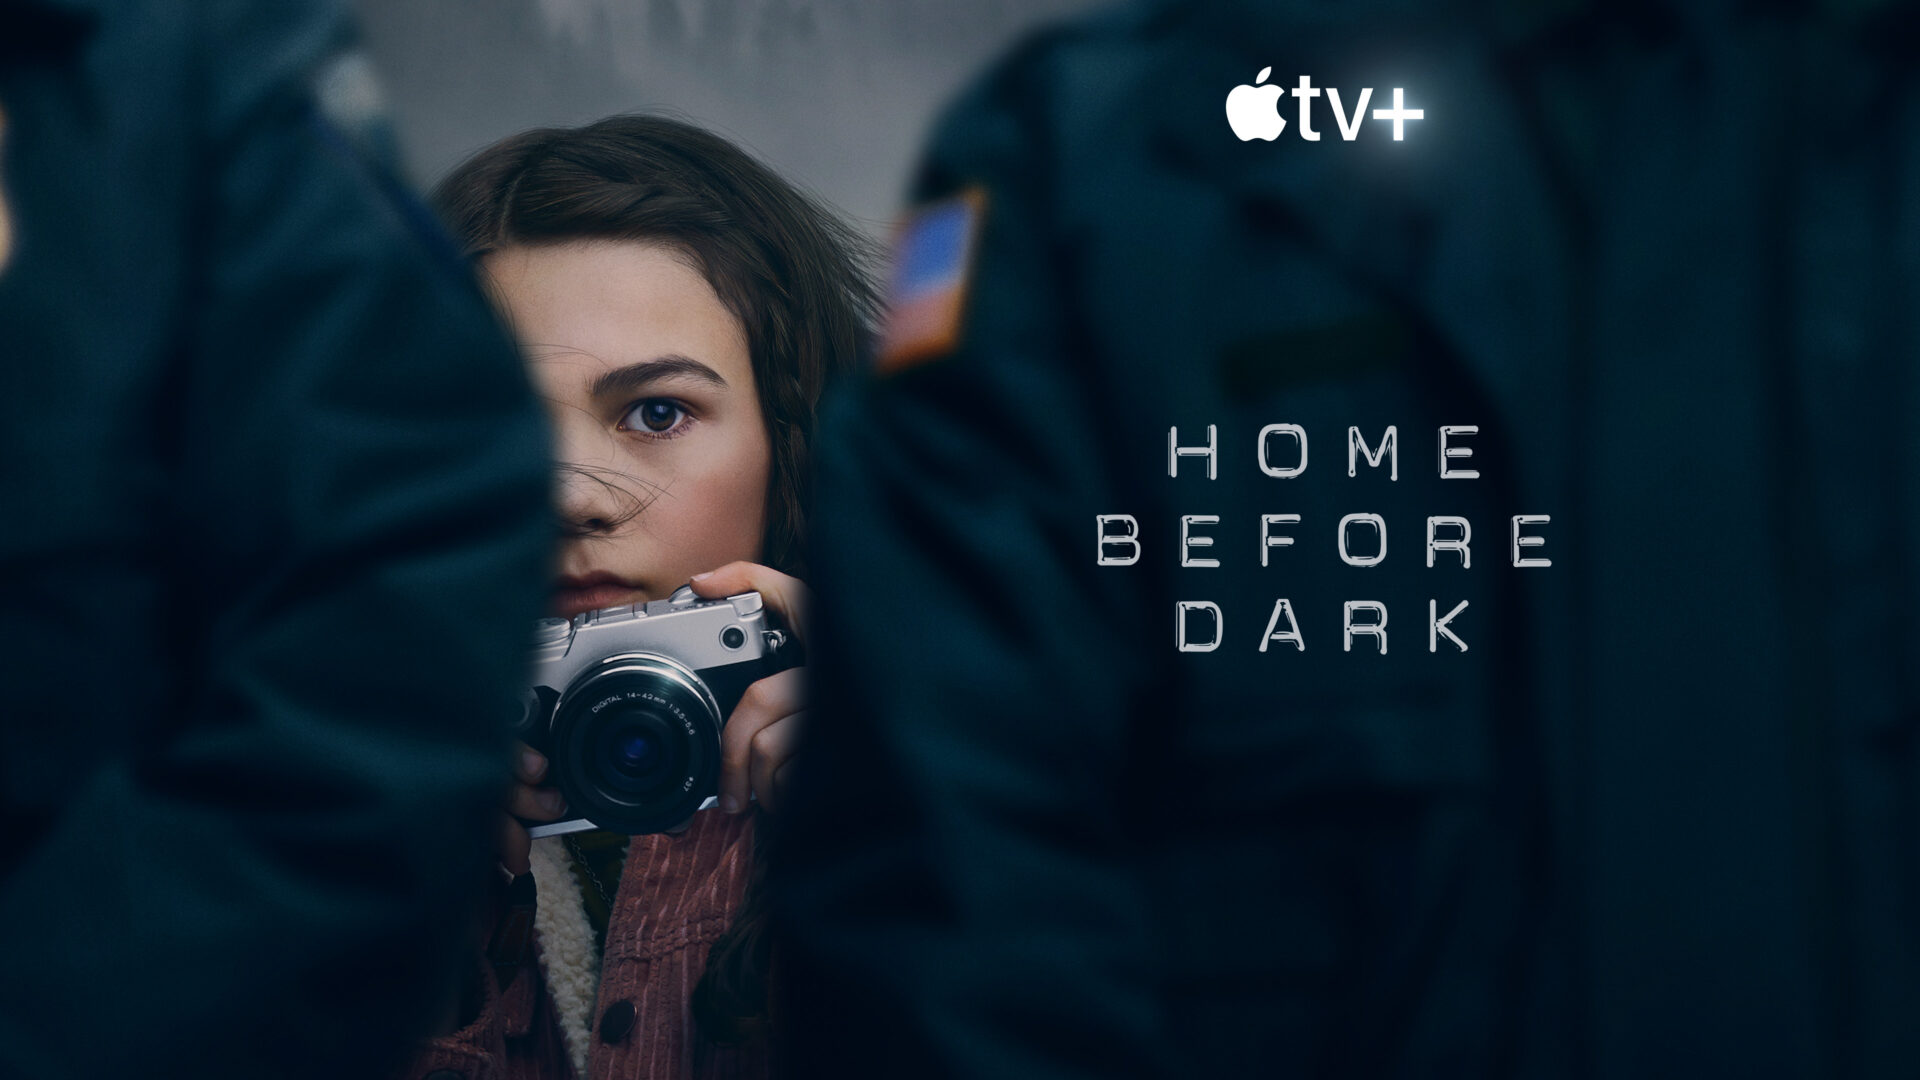 Apple_TV_Home_Before_Dark_key_art_16_9